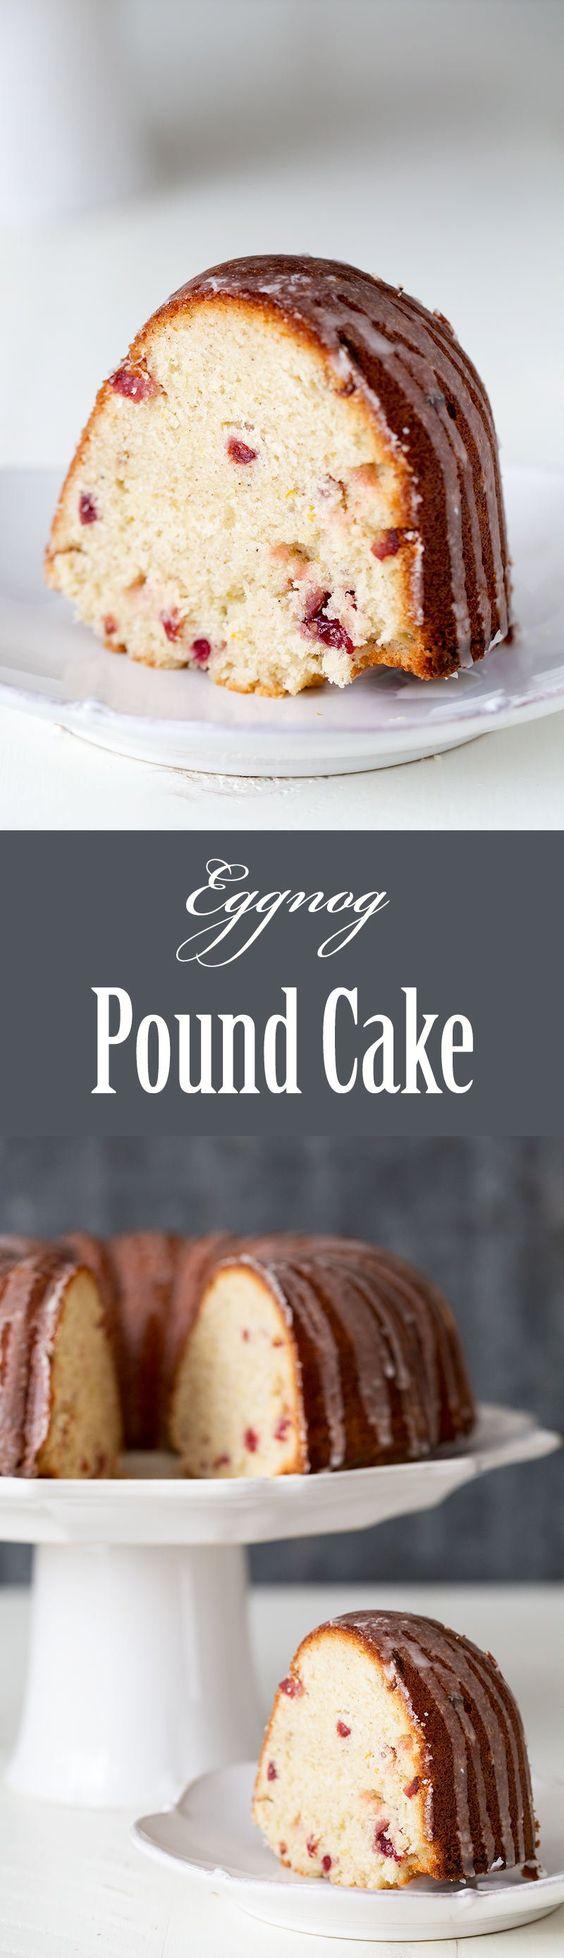 ... pound cake with eggnog, dried cranberries, brandy, nutmeg and orange